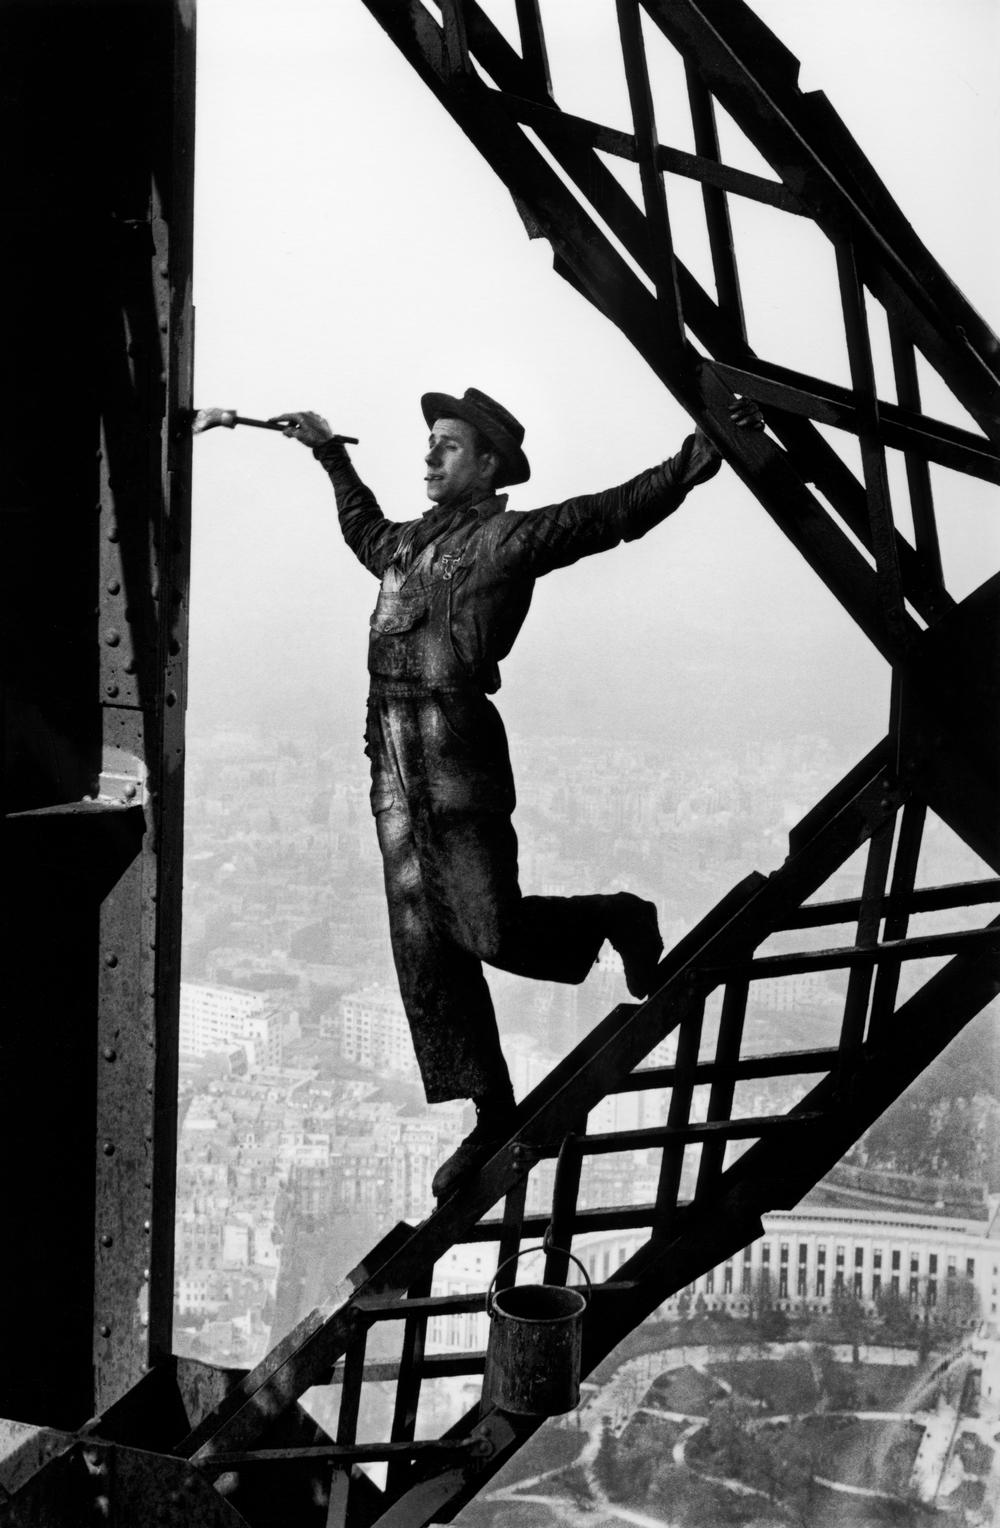 Maler auf dem Eifel-Turm in Paris 1953 - Alle Fotorechte: © Marc Riboud